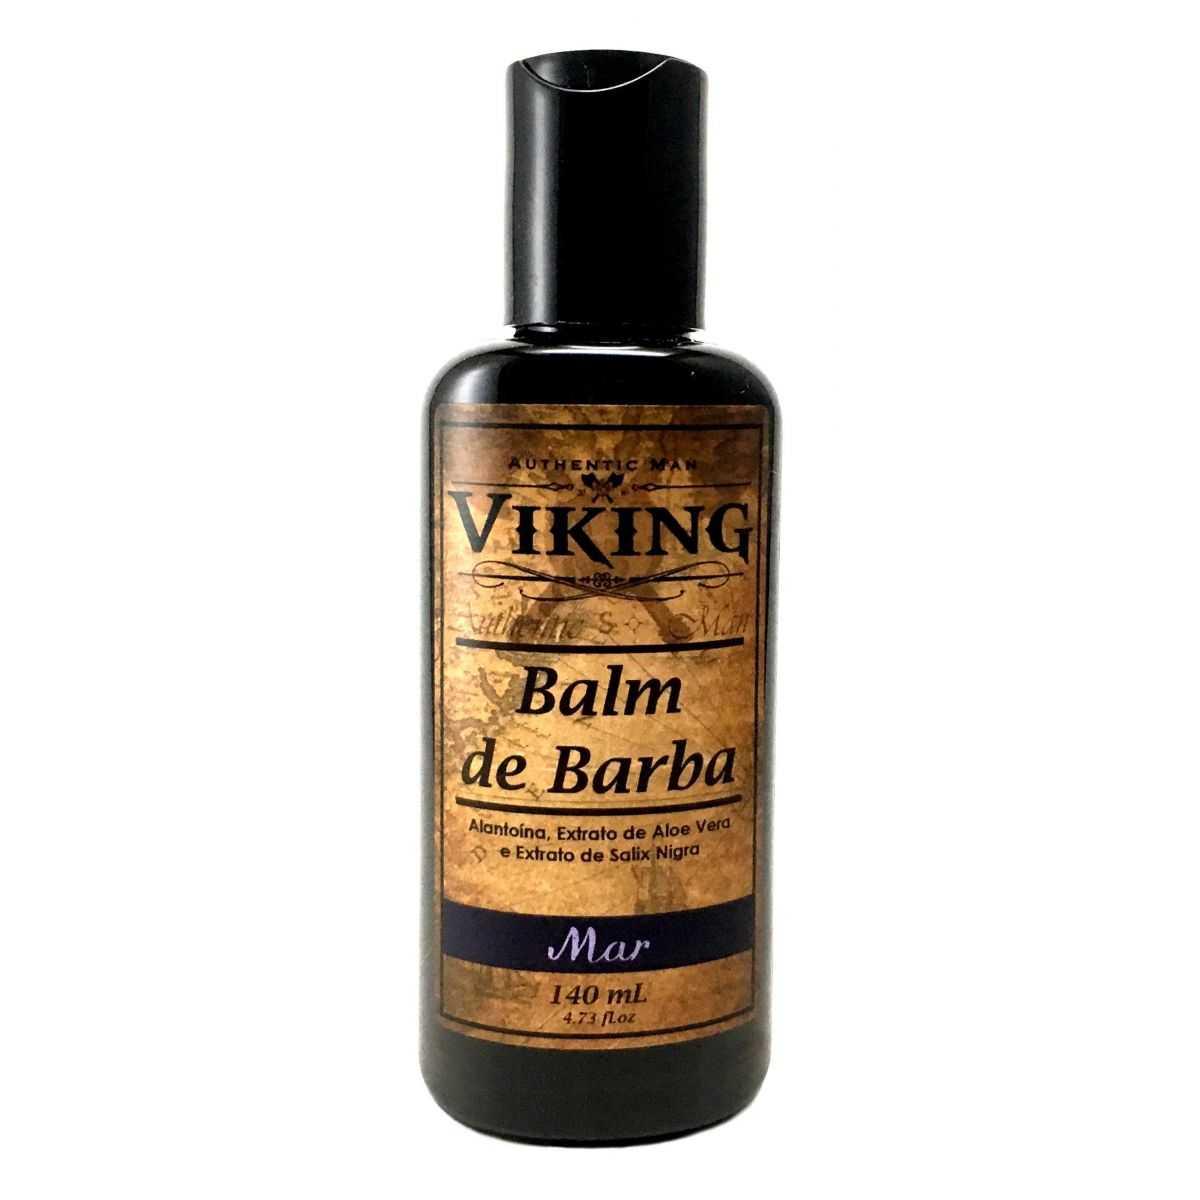 Kit de Barba - Linha Mar com Pente Curvo - Viking  - Viking